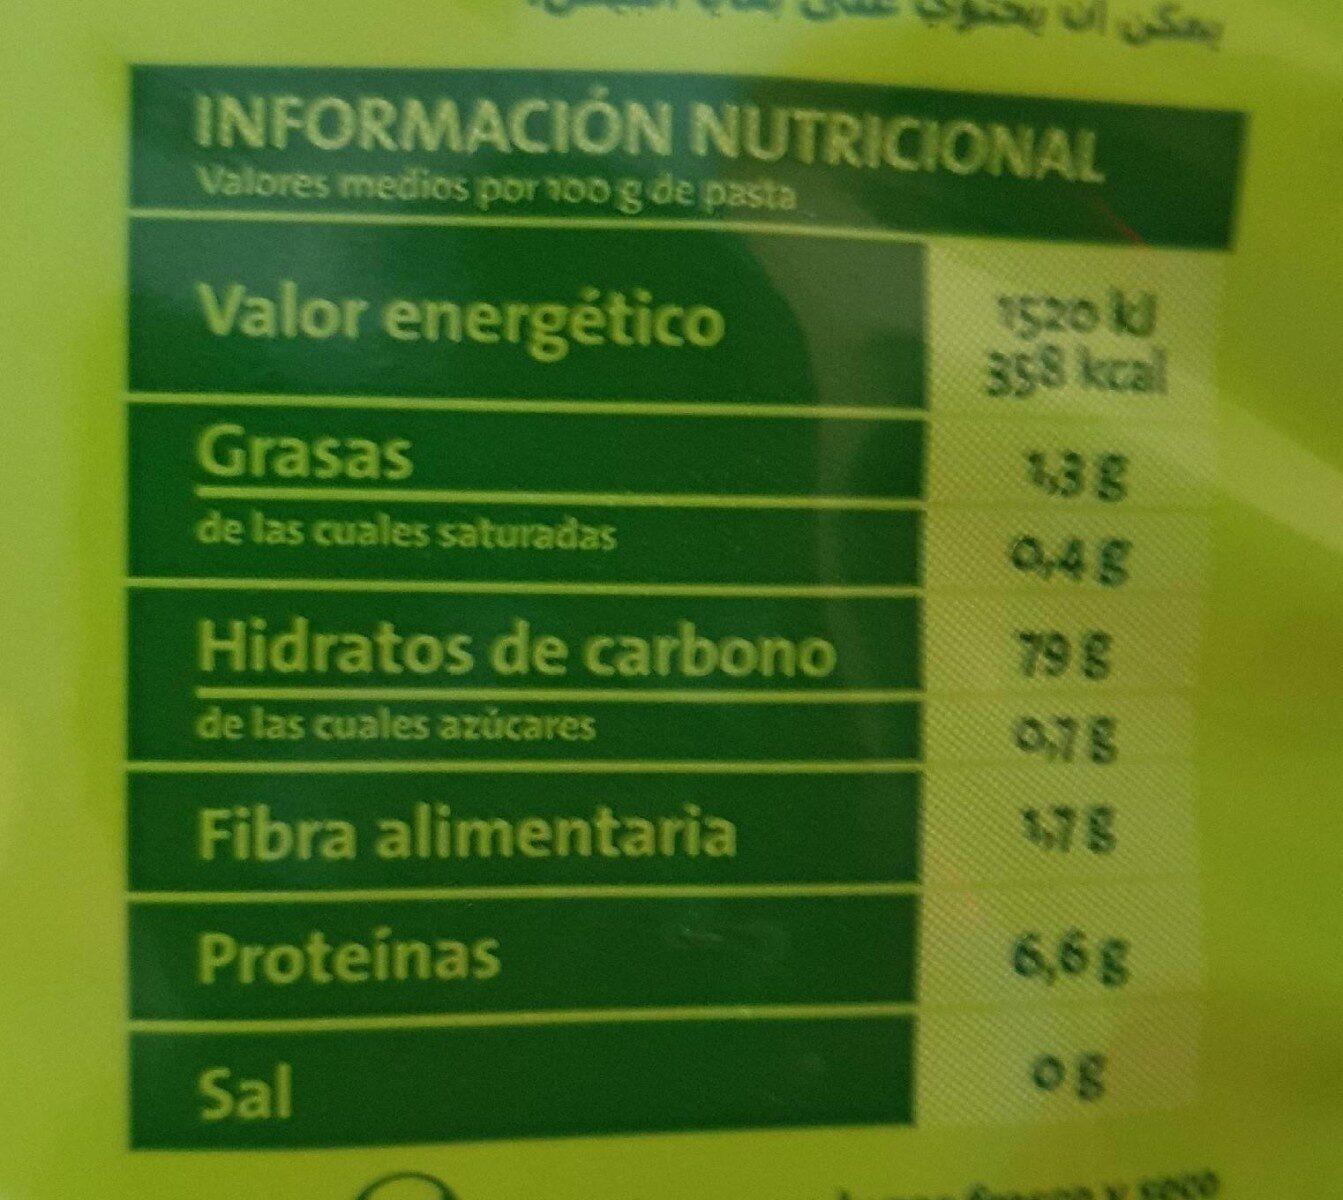 Pasta sin gluten - Informació nutricional